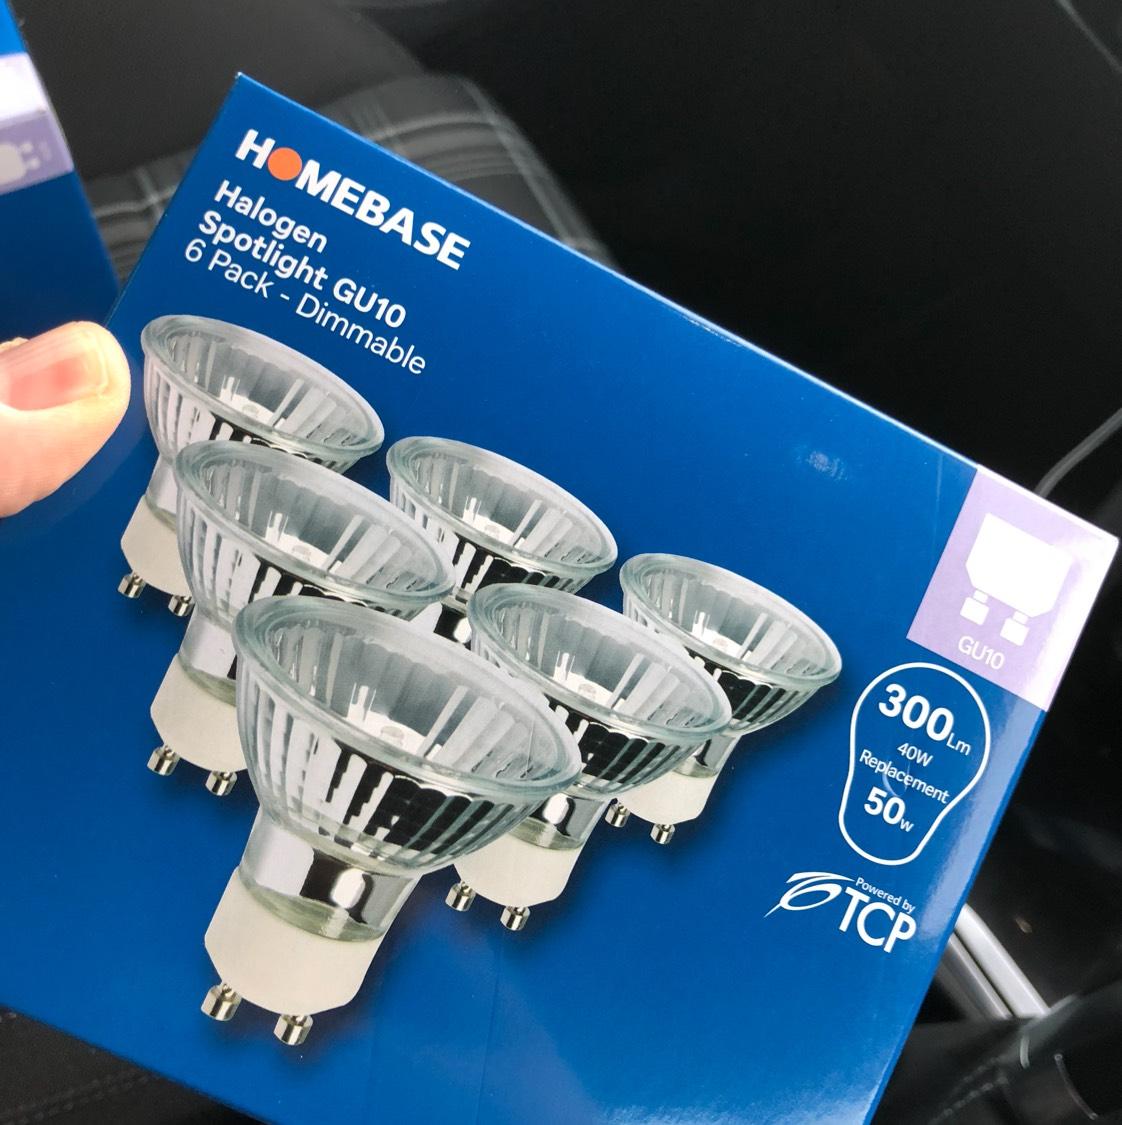 Halogen GU10 40w bulb x 6 @ Homebase - £1